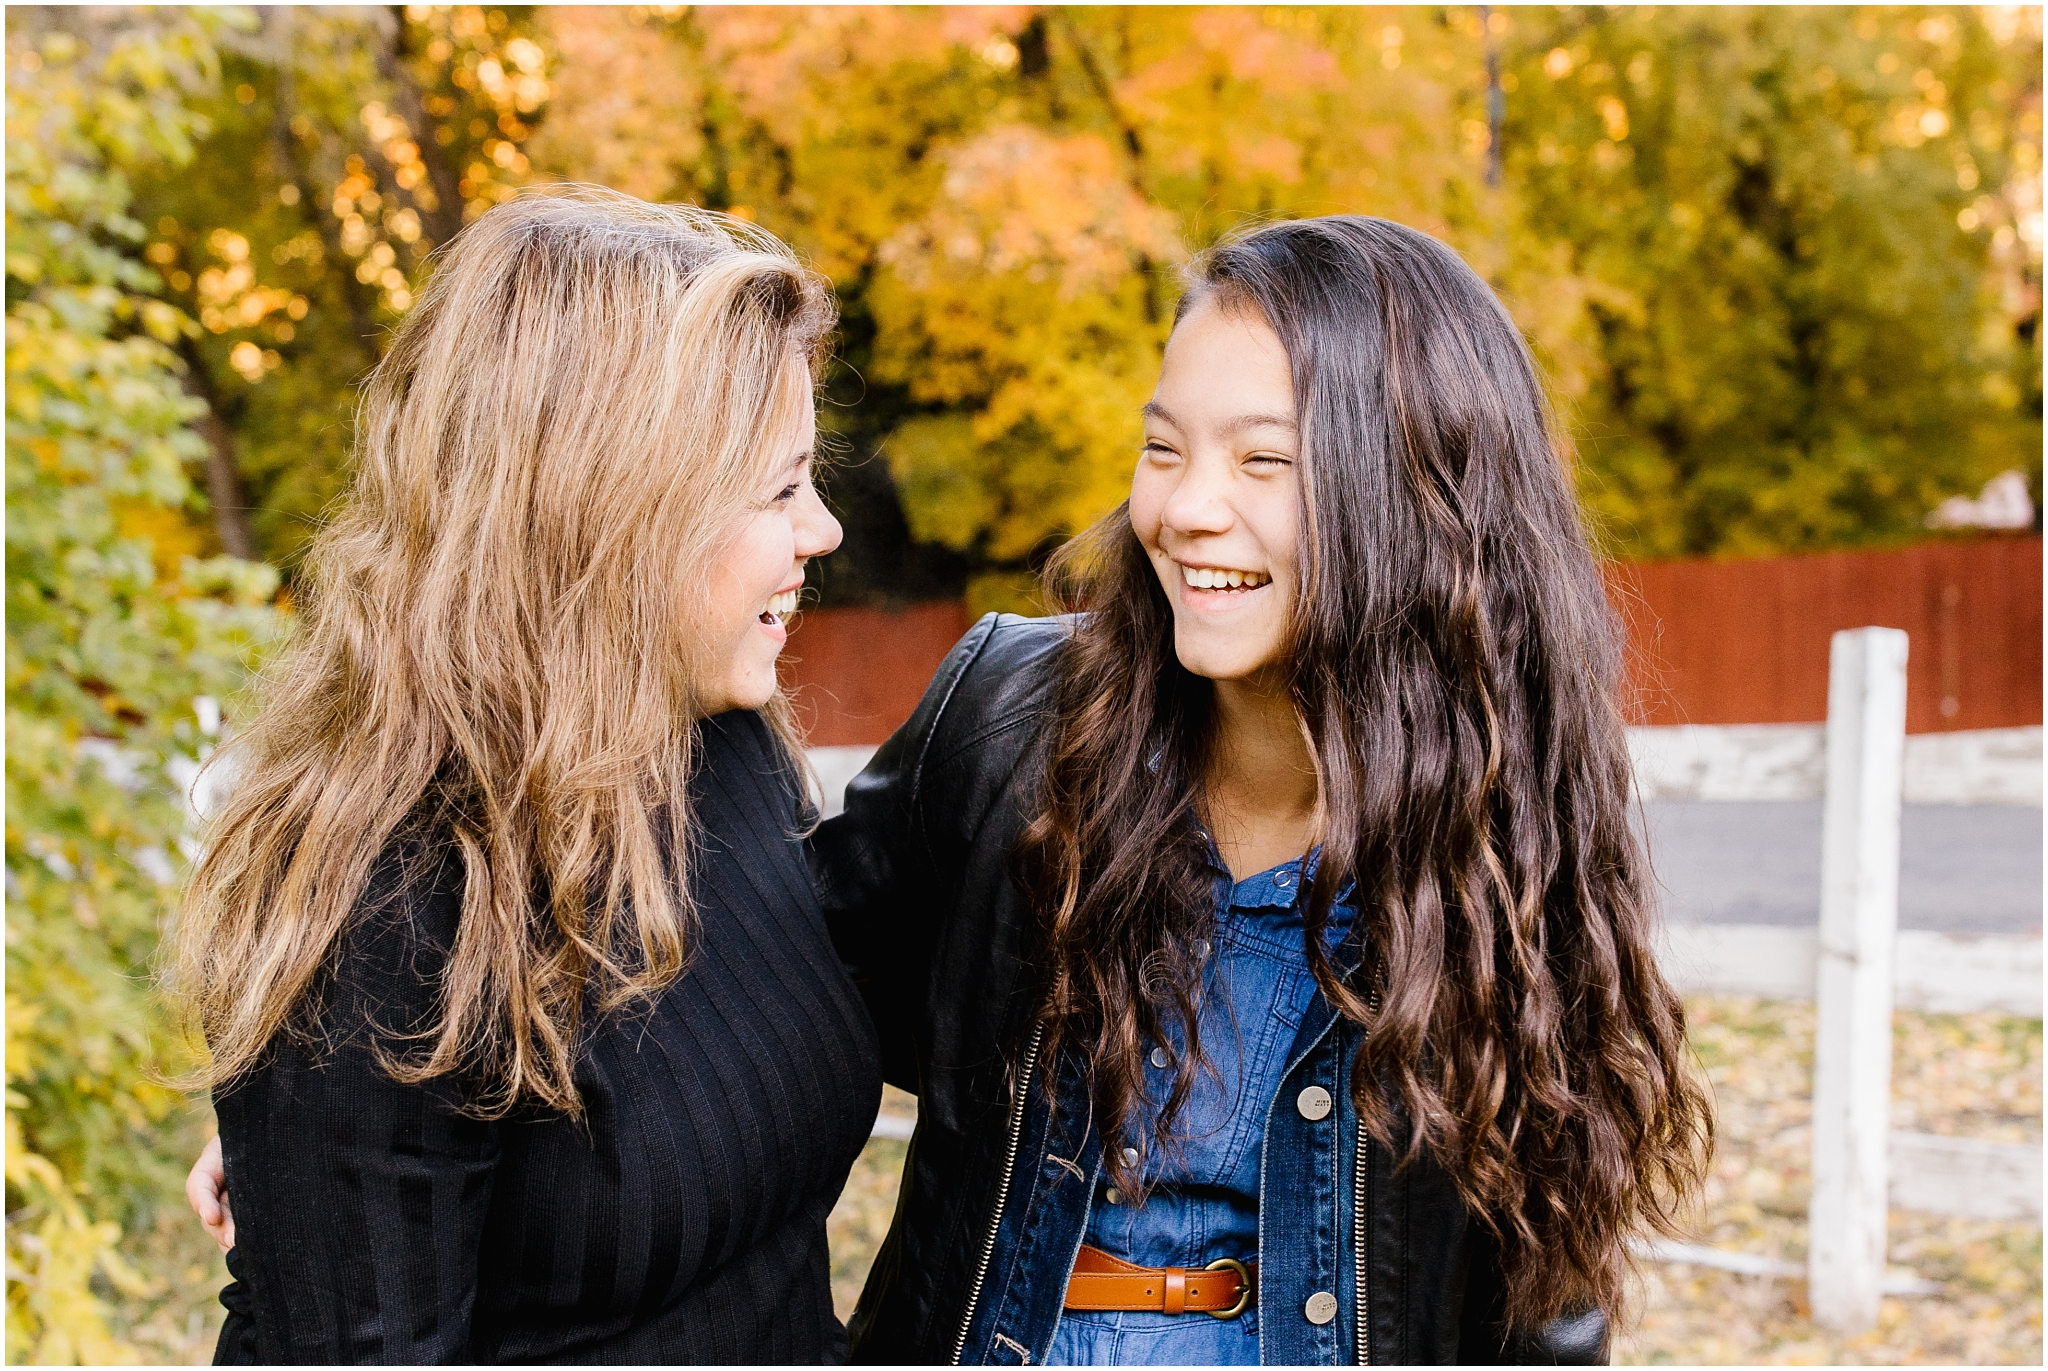 Qian-95_Lizzie-B-Imagery-Utah-Family-Photographer-Salt-Lake-City-Park-City-Utah-County-Hobble-Creek-Canyon-Jolleys-Ranch.jpg